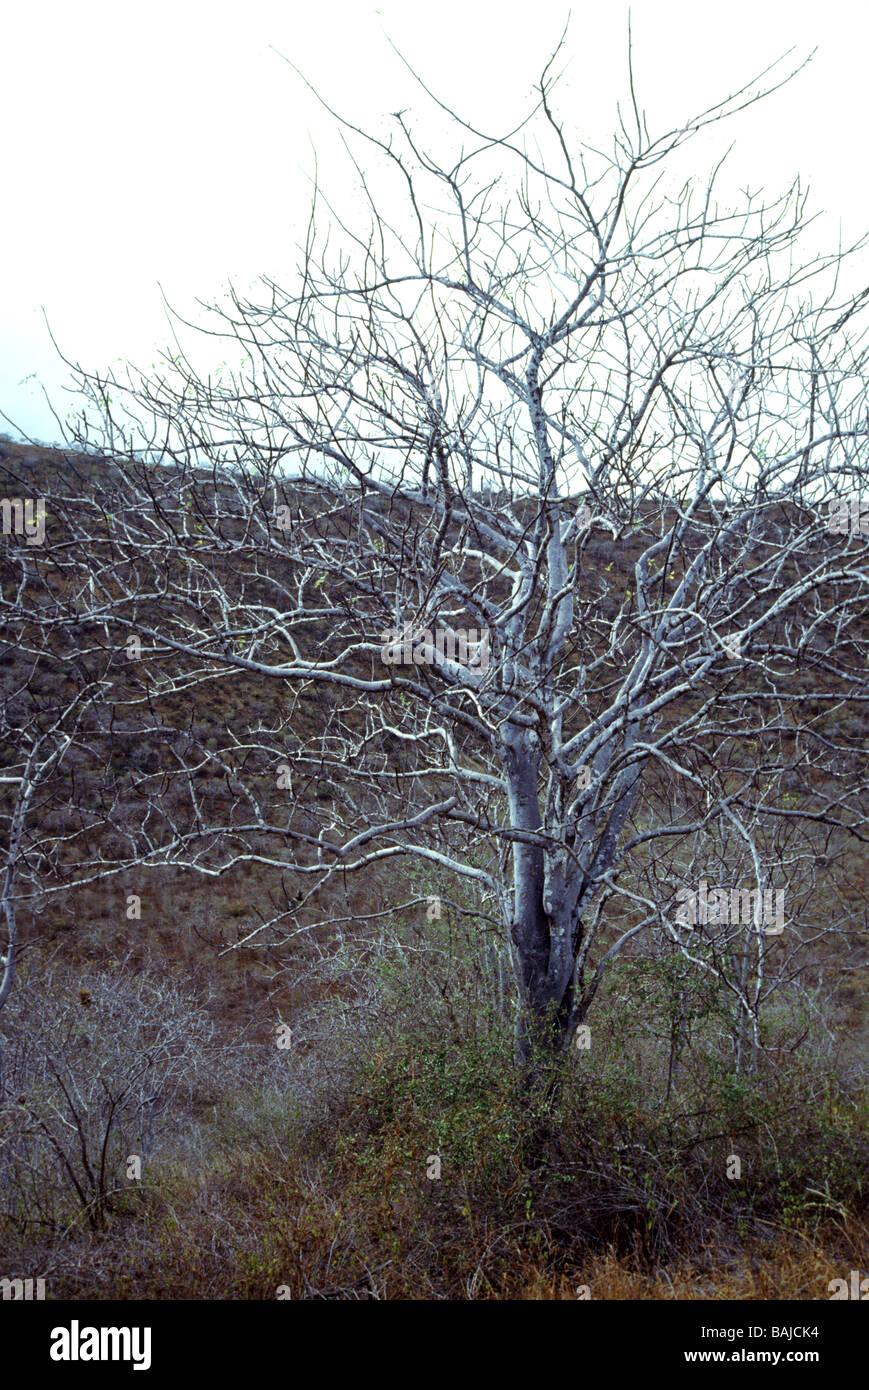 "Galapagos Inseln. Palo Santo Tree' Bursera graveolens"" in der trockenen Jahreszeit. keine Blätter. Stockbild"